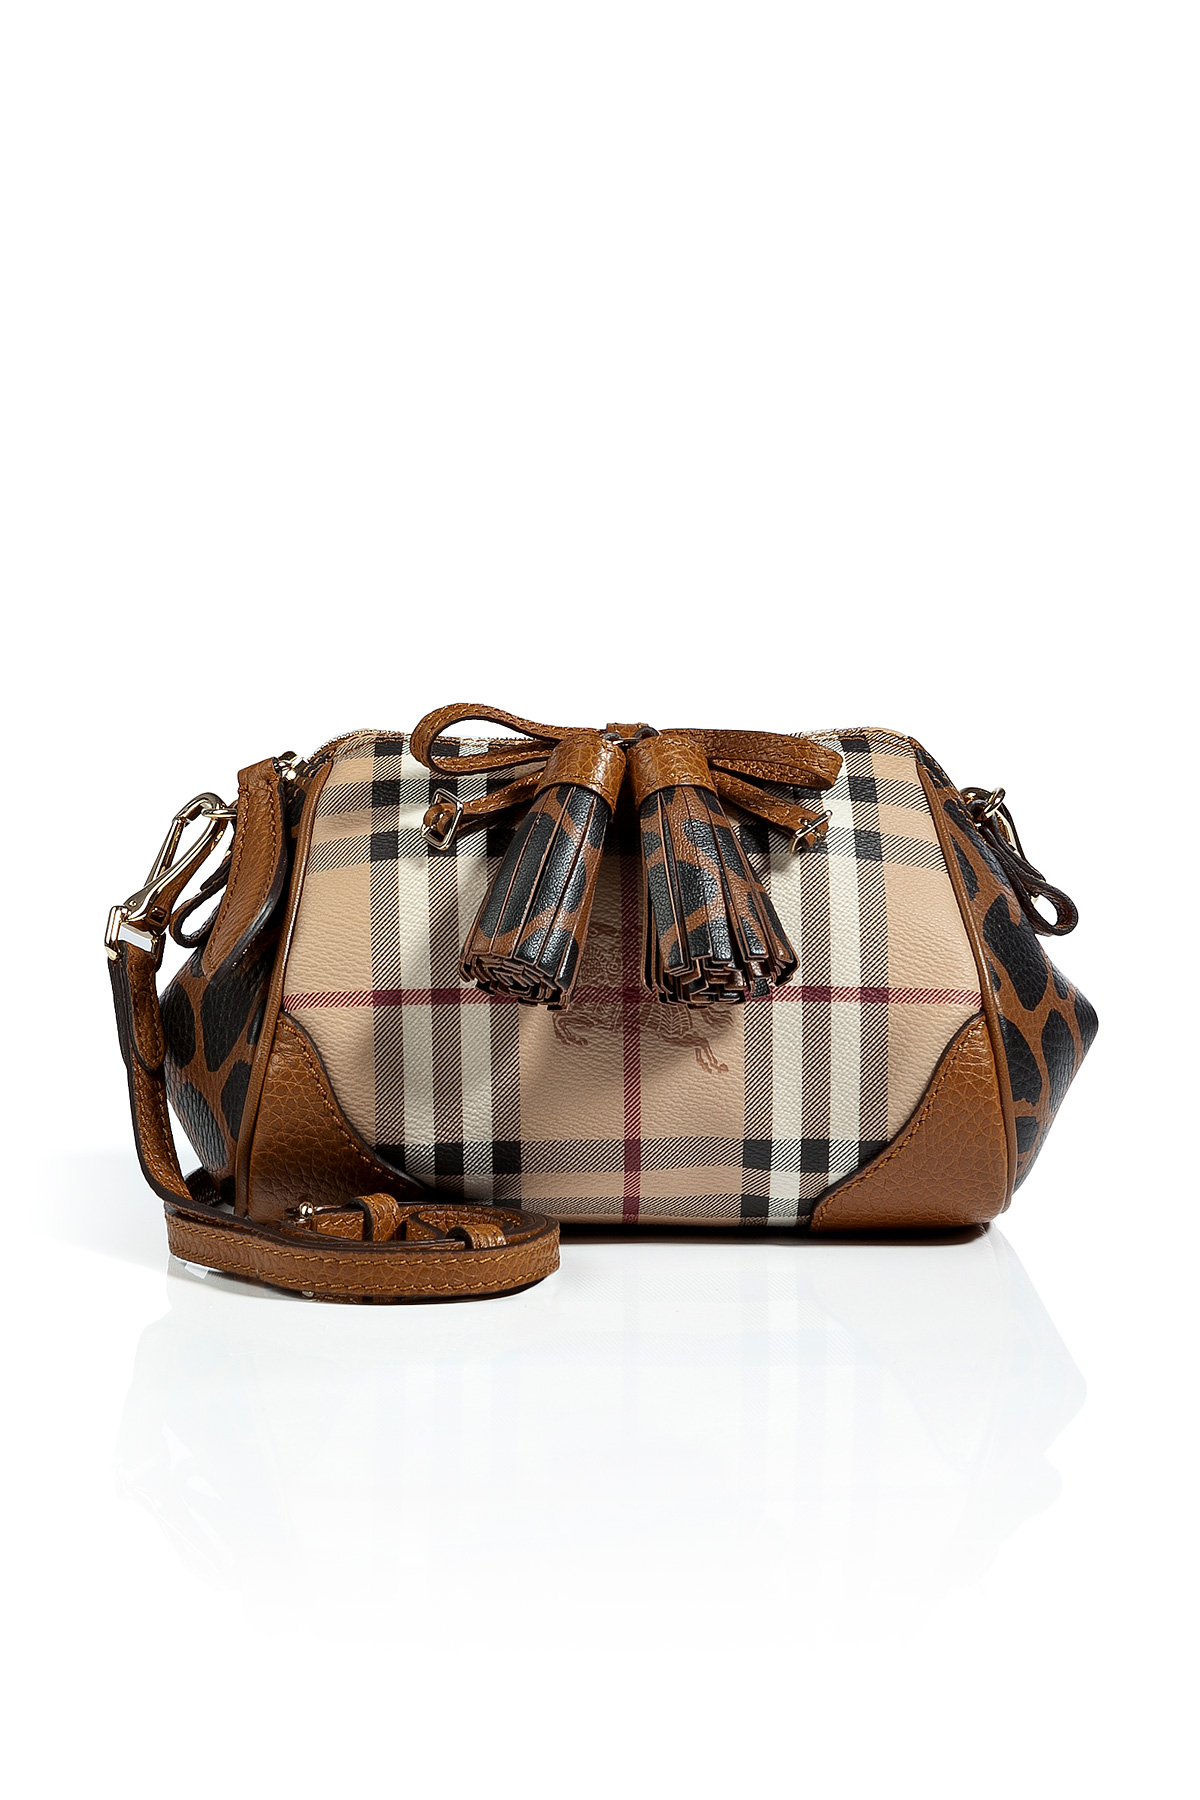 Burberry Haymarket Mini Blaze Crossbody Bag in Brown - Lyst